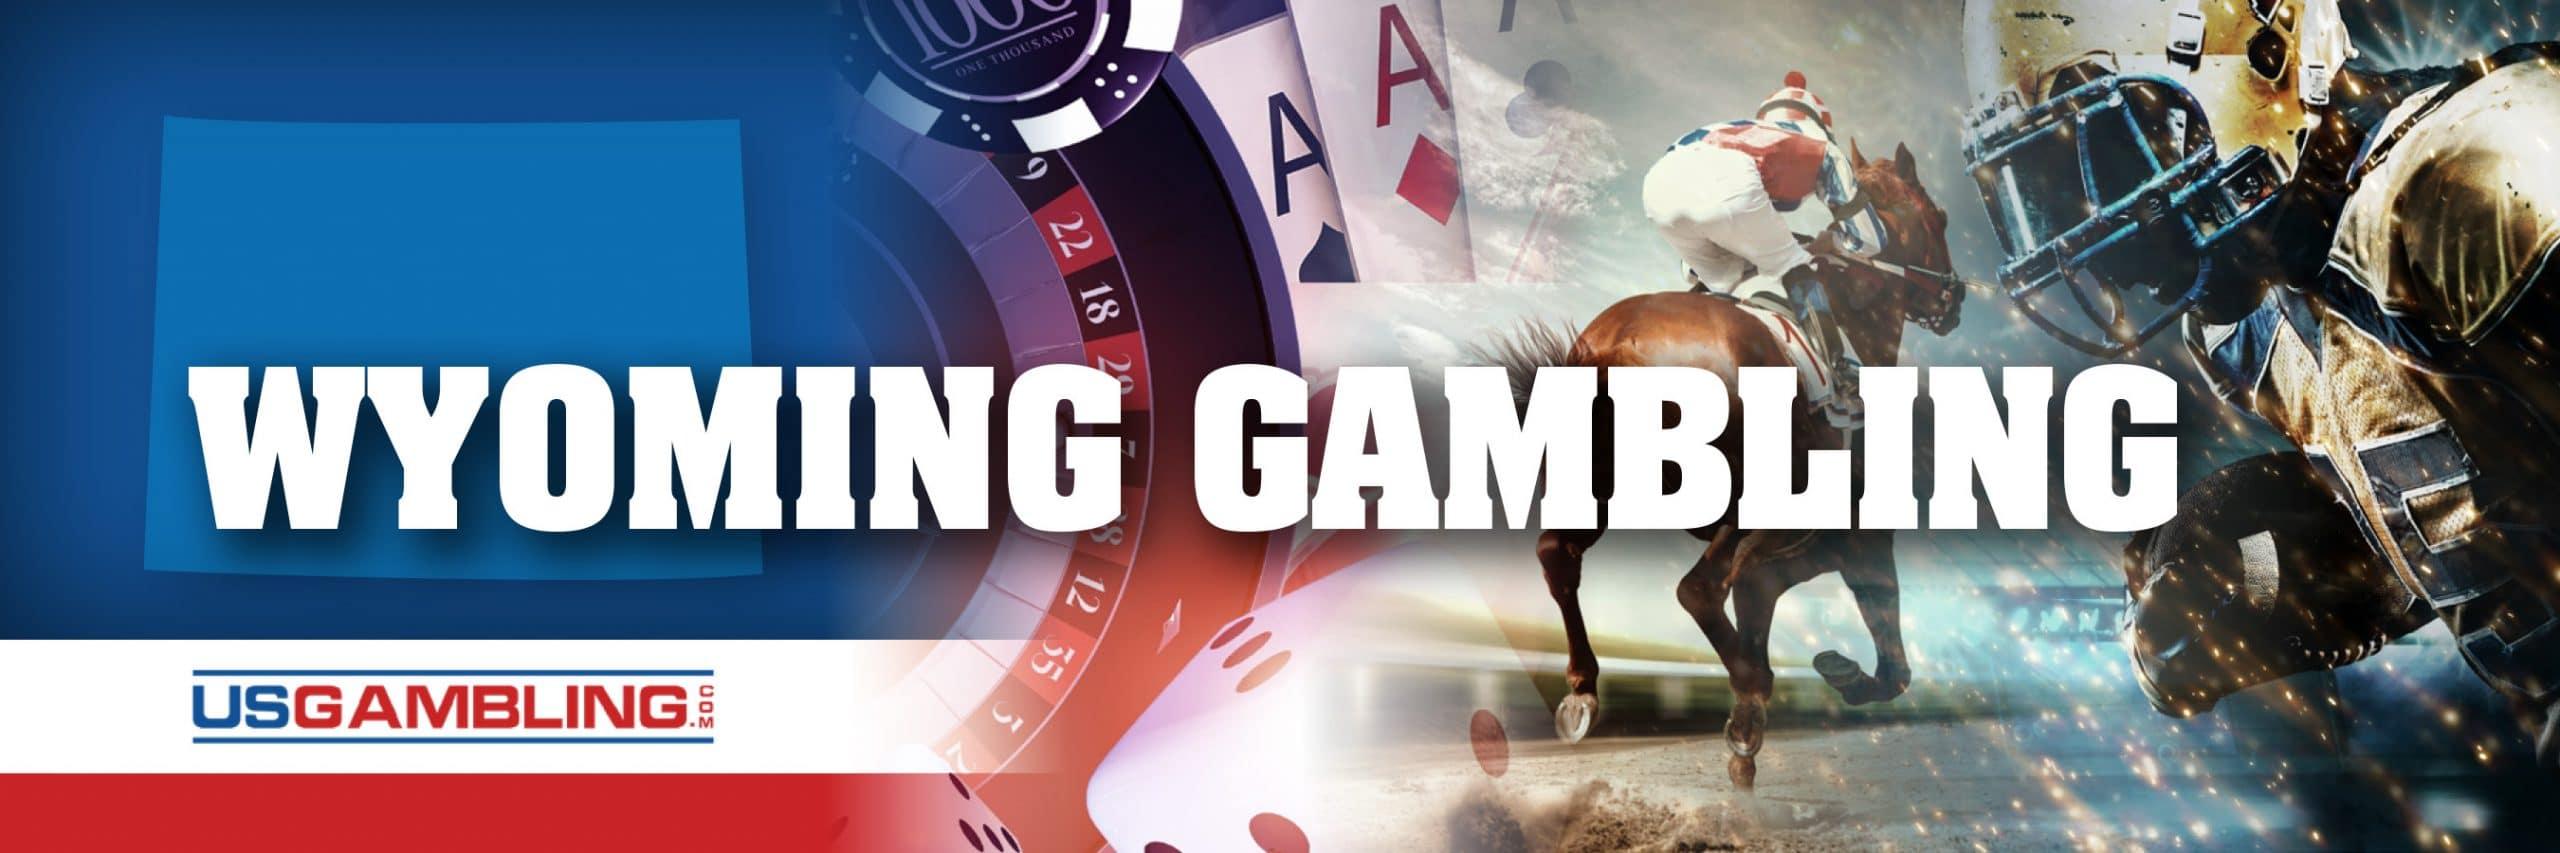 Legal Wyoming Gambling